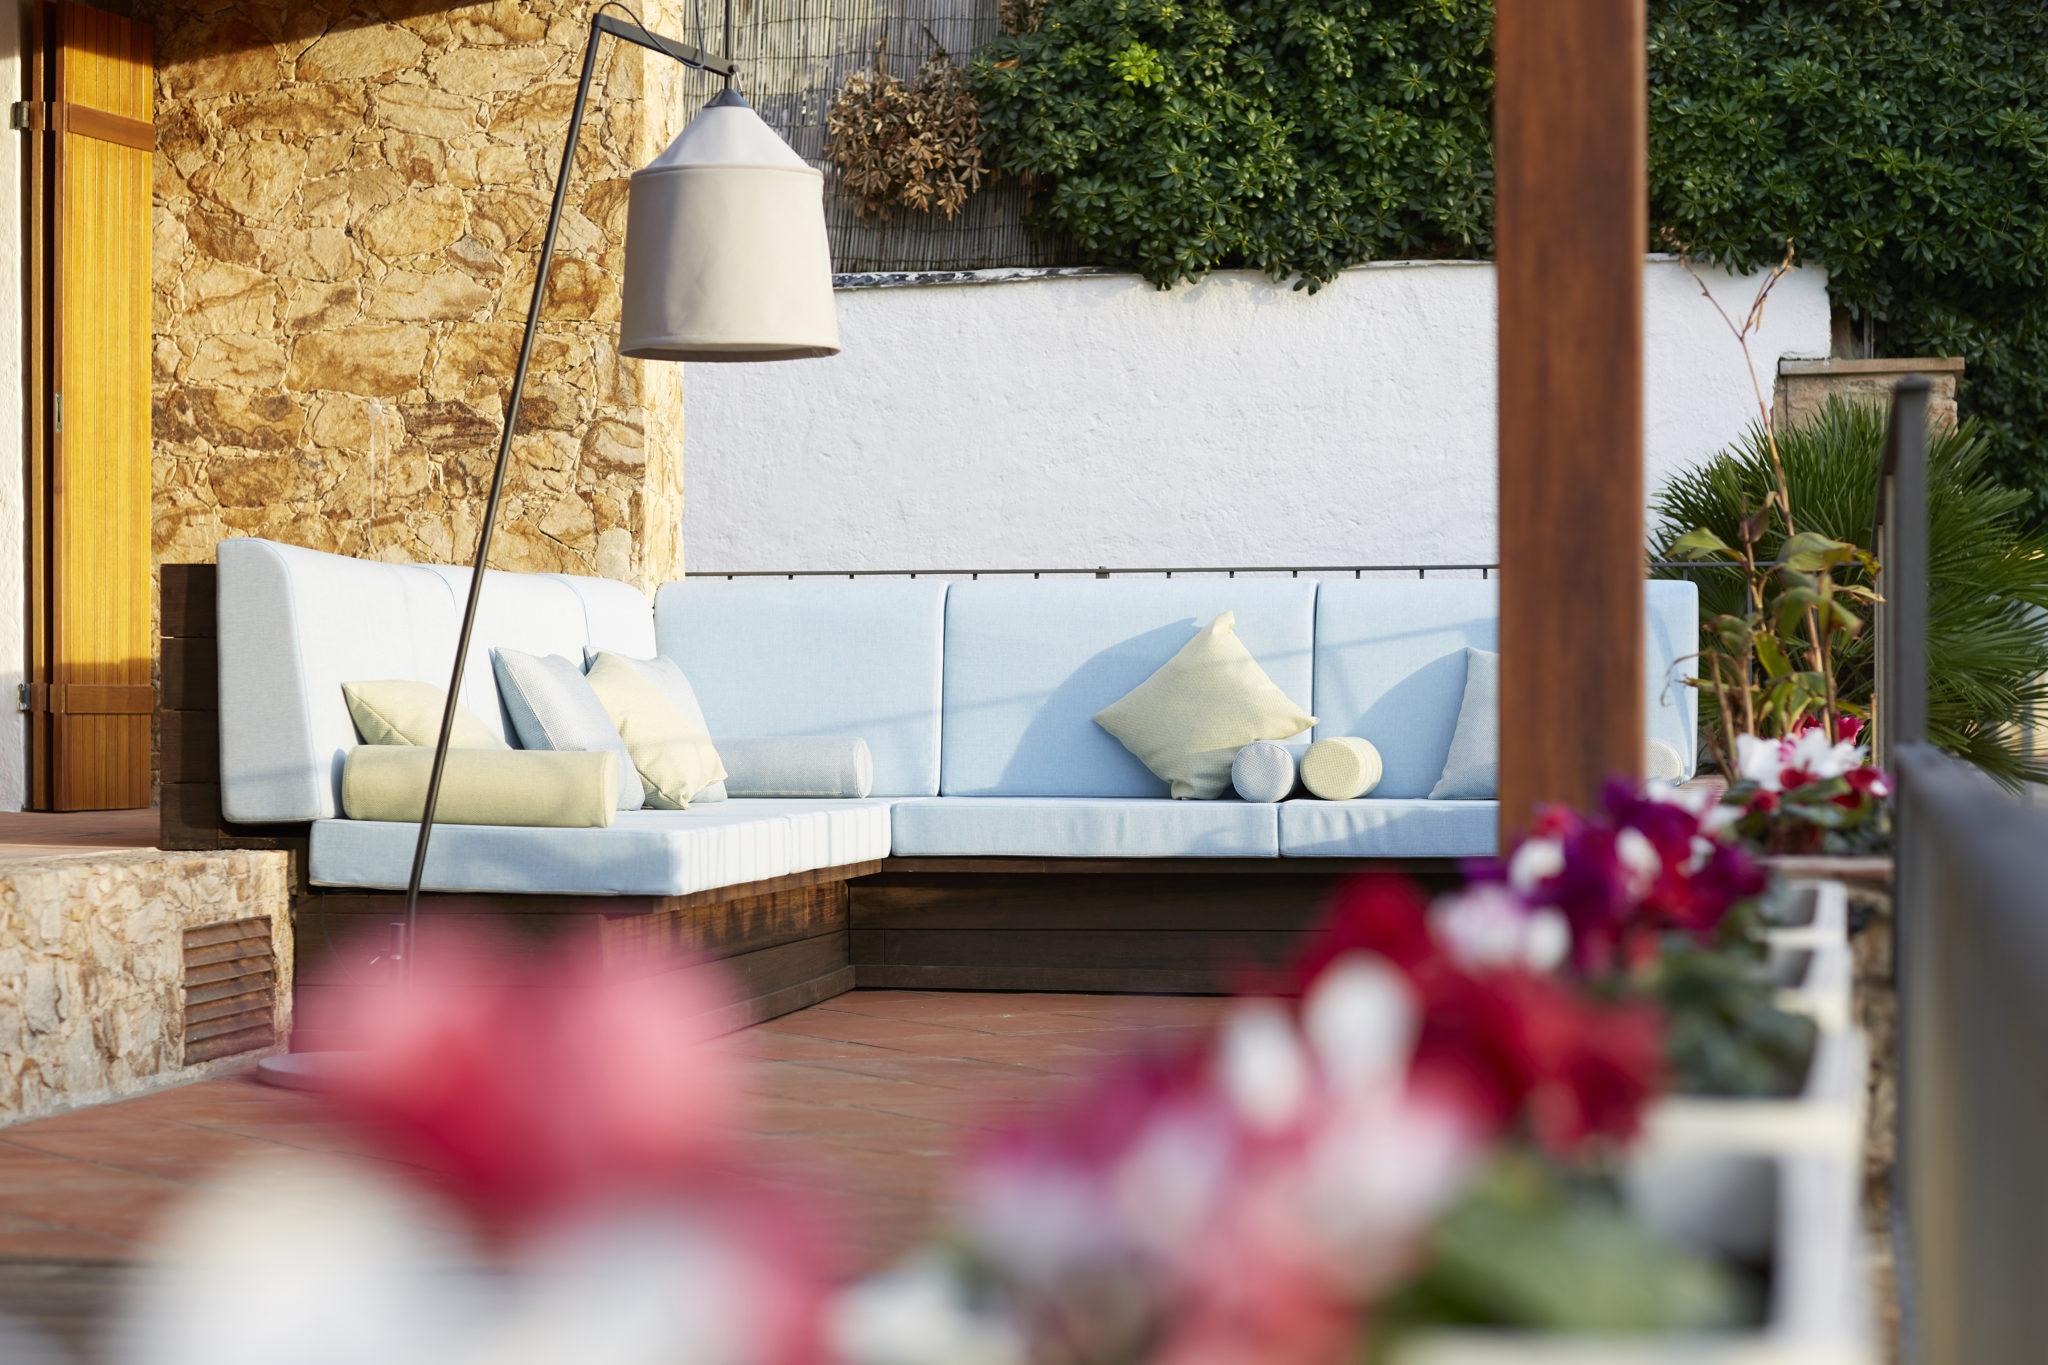 Chillout exterior por Rosa Colet Interior Design